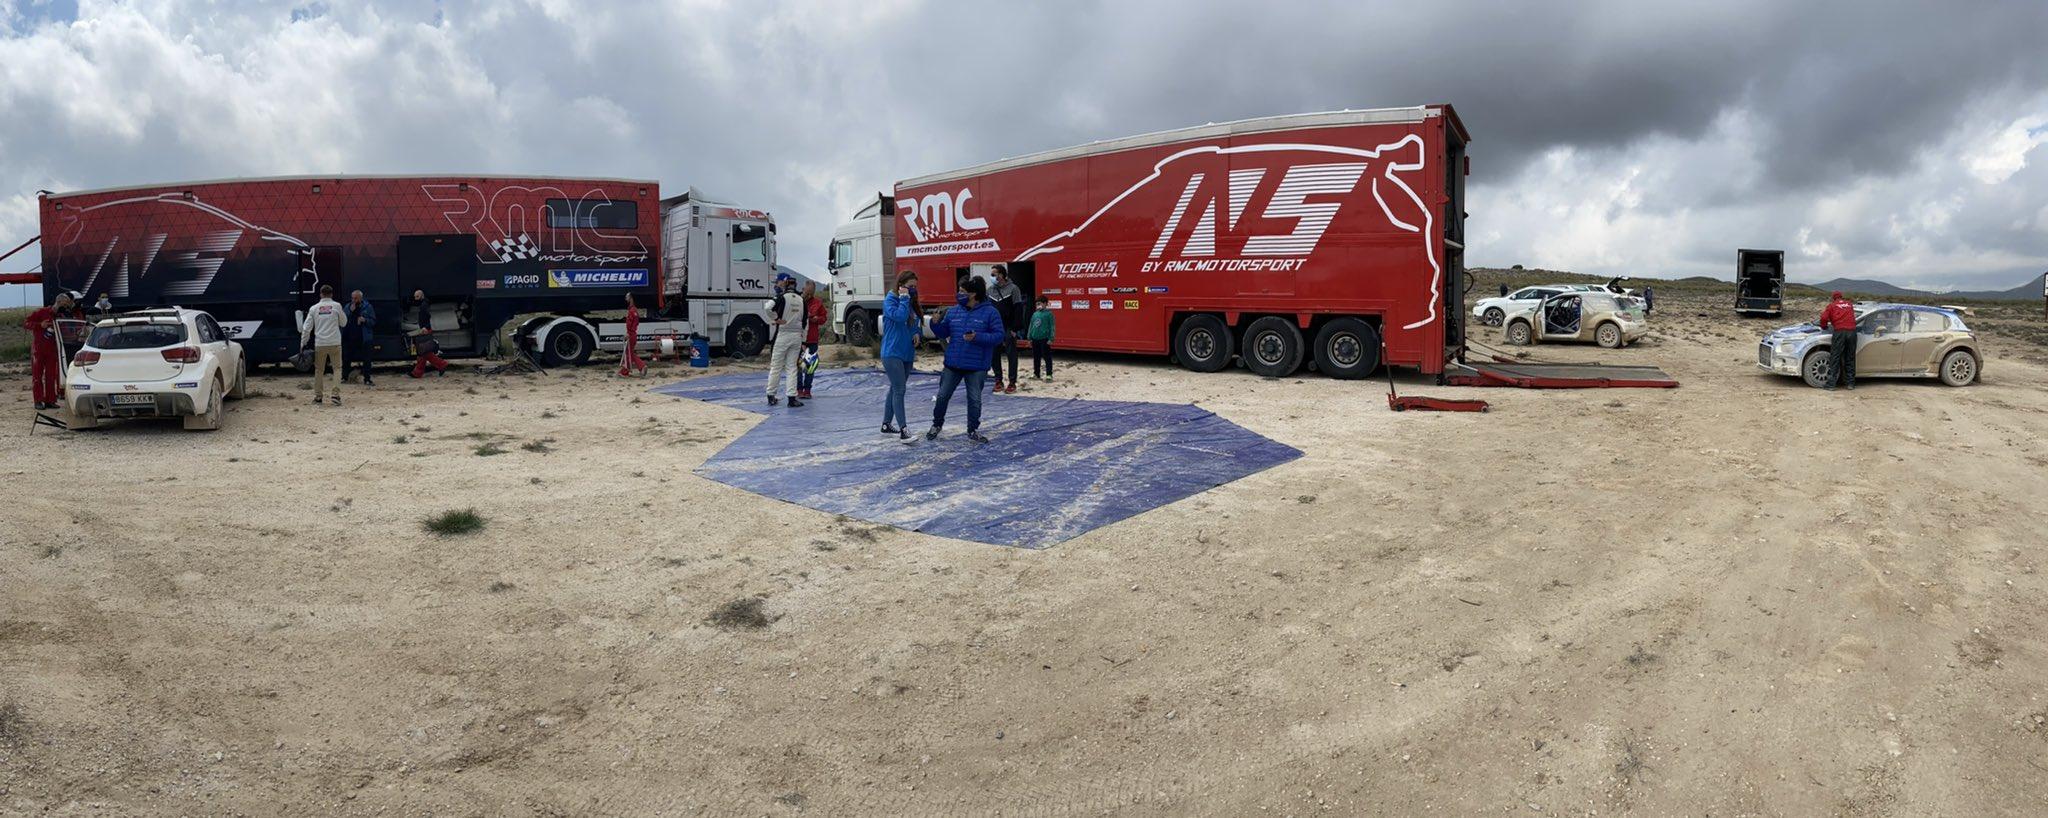 SCER + CERT: 10º Rallye Tierras Altas de Lorca [23-24 Abril] EzmF5mKXEAYxWmB?format=jpg&name=large